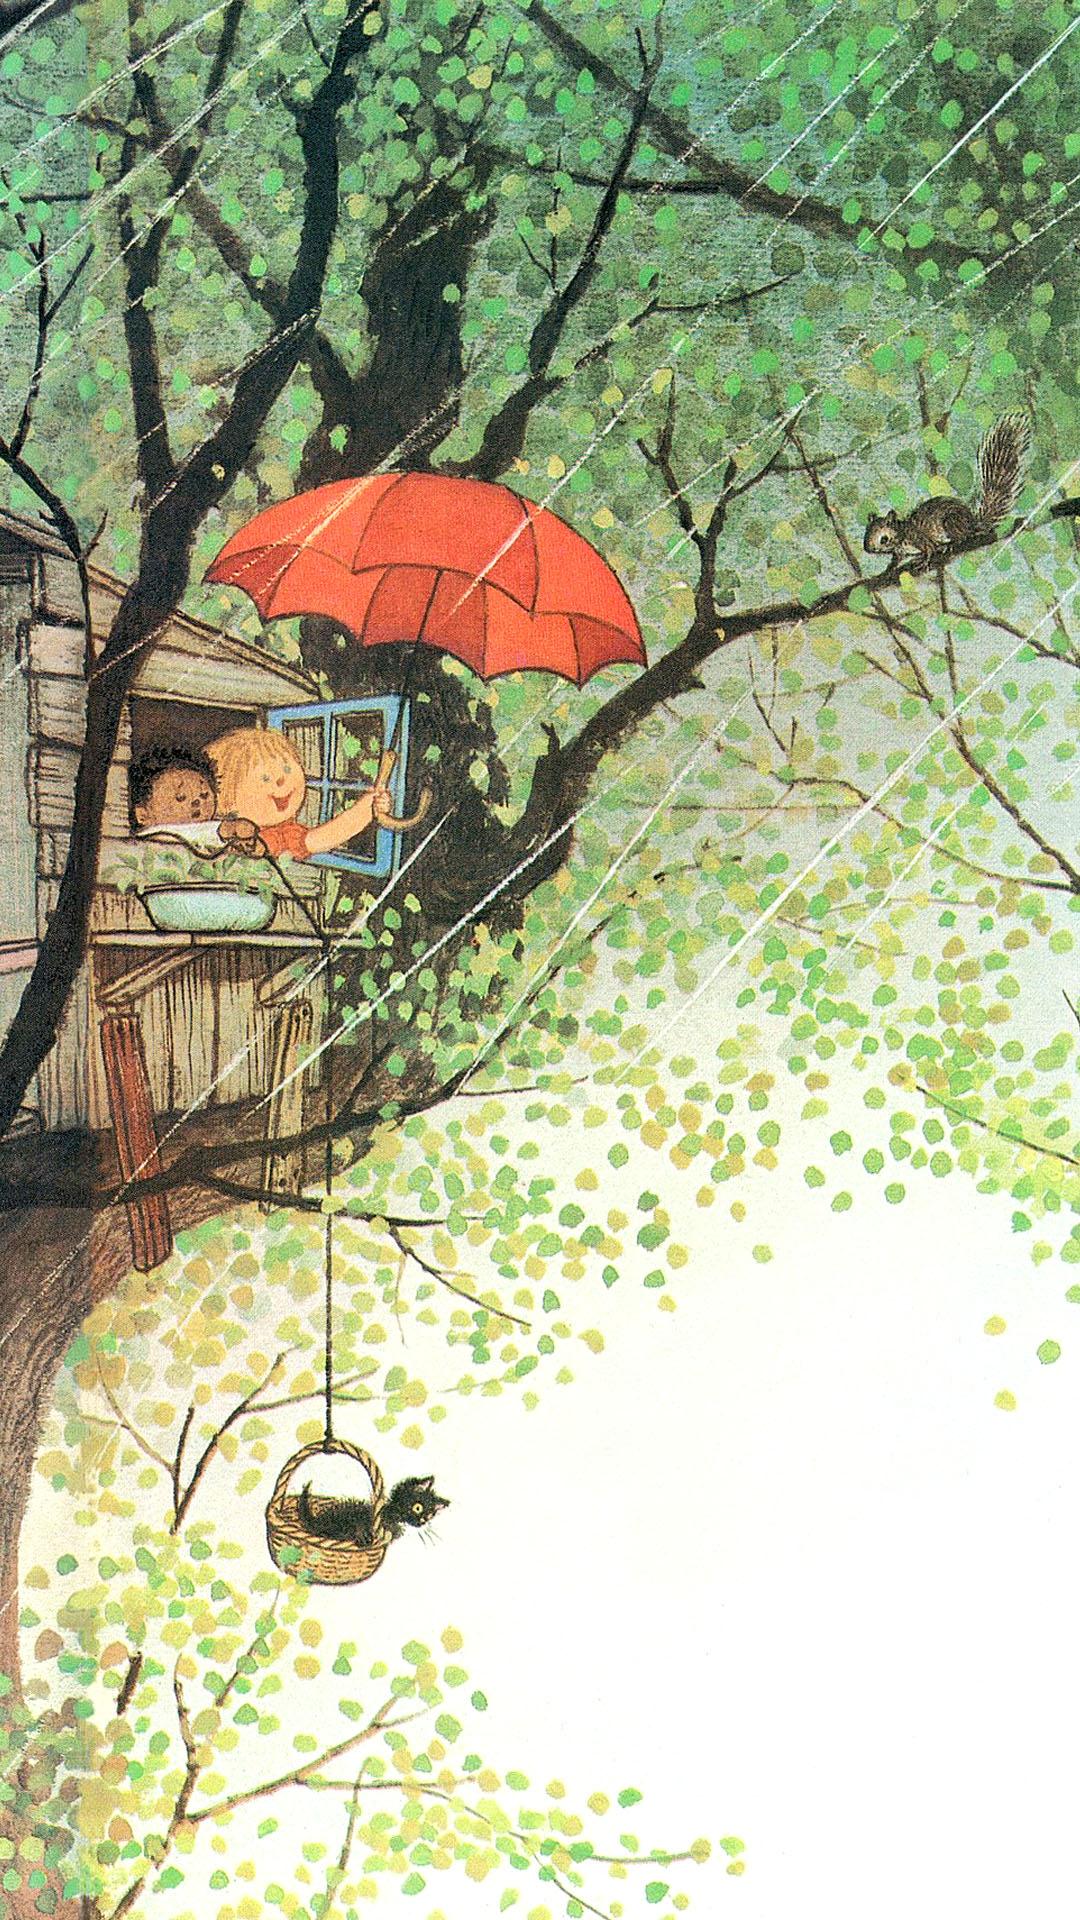 Gyo Fujikawa - It's raining! 1080x1920